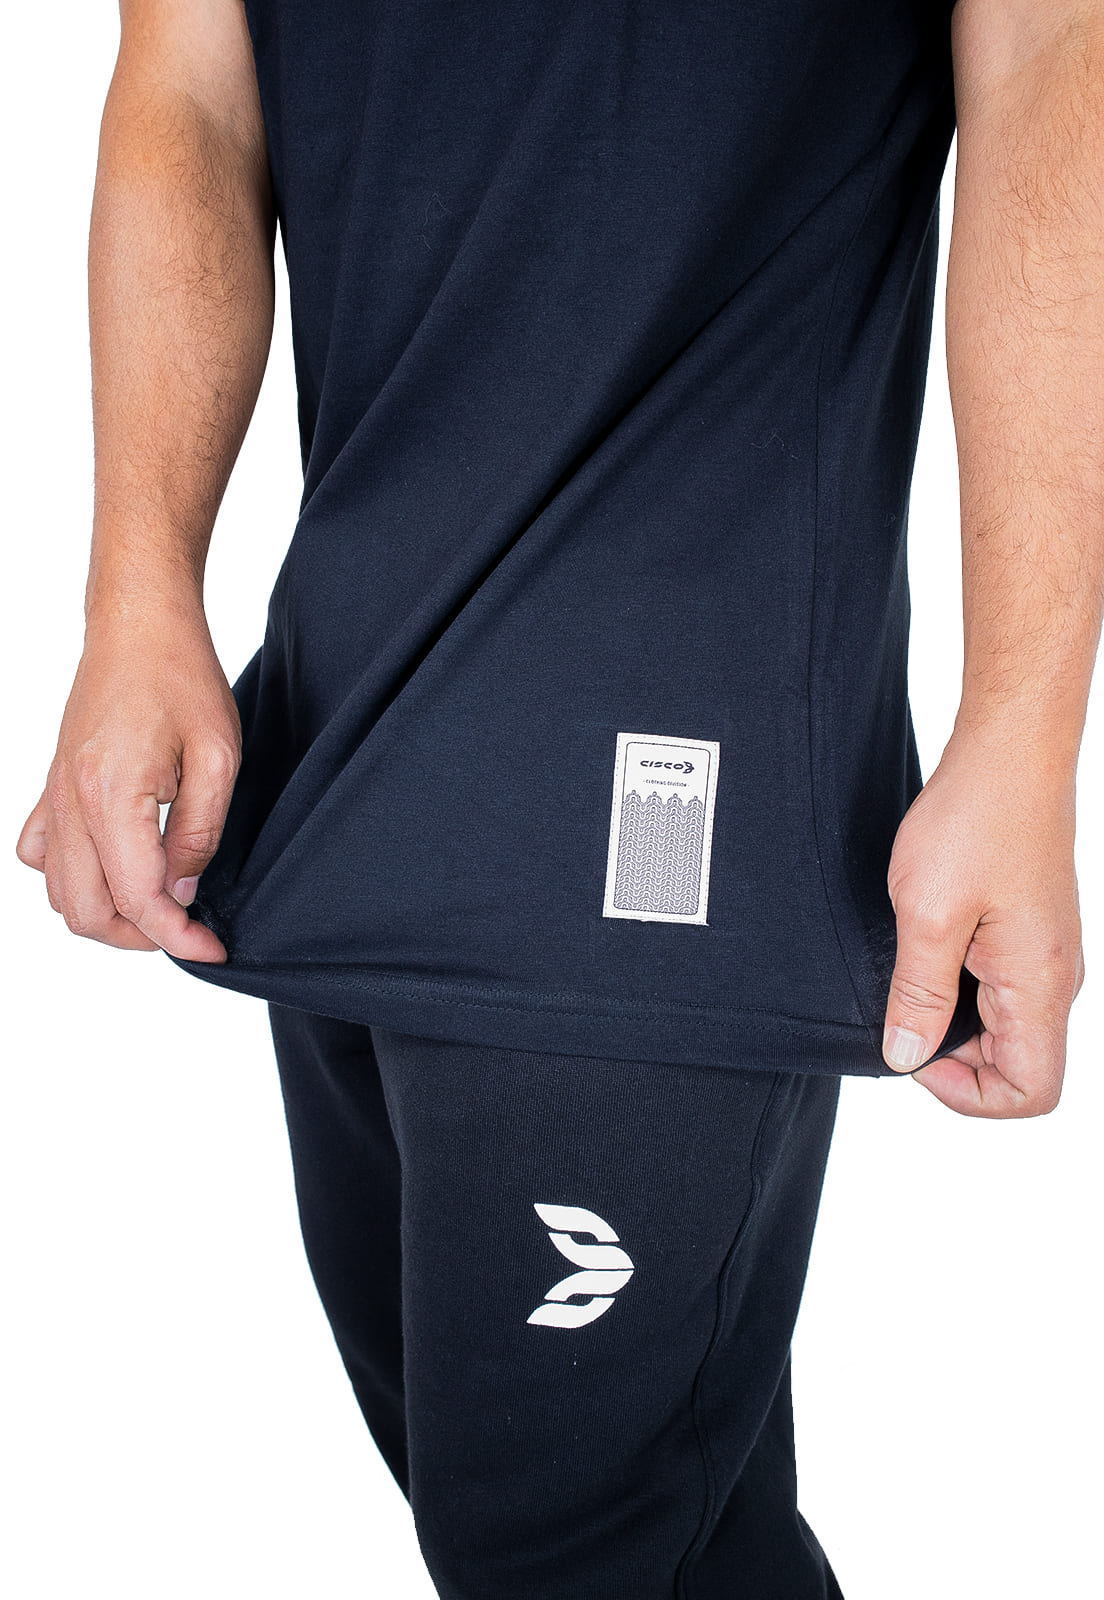 Camiseta Cisco Skate Clothing Basica Preta